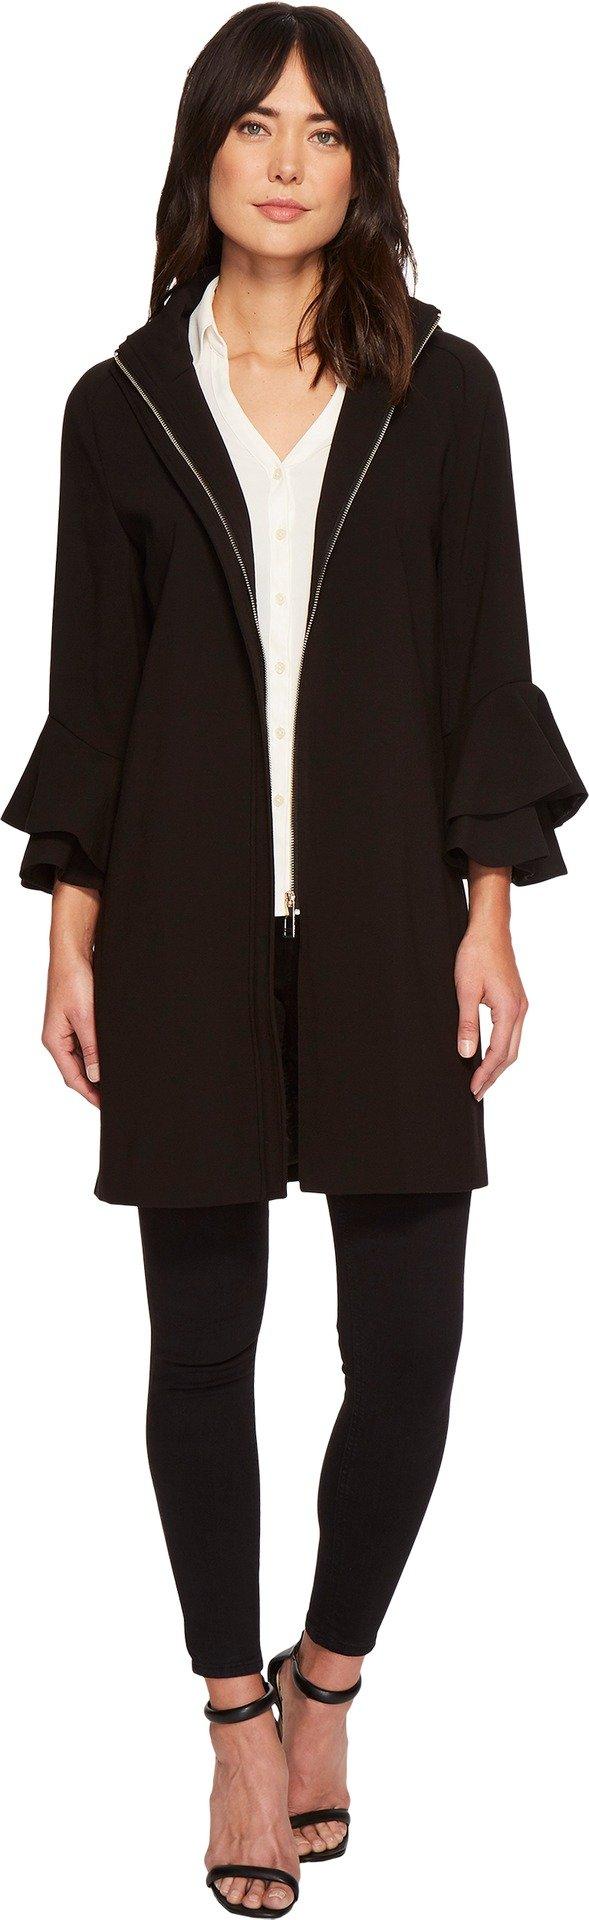 Ivanka Trump Womens Softshell Flutter Sleeve Hooded Jacket Black XL (US 16) One Size